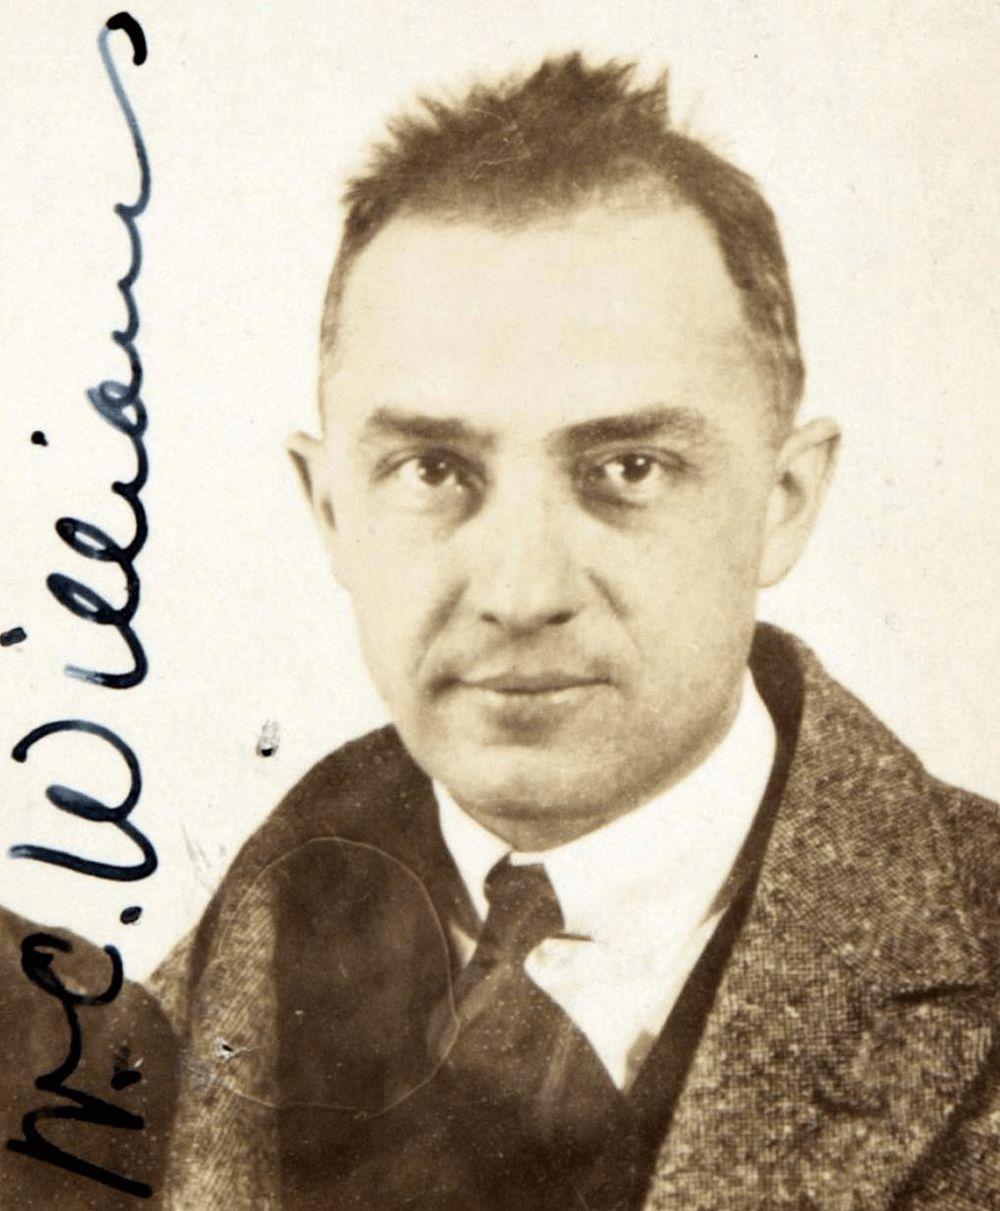 Уильям Карлос Уильямс